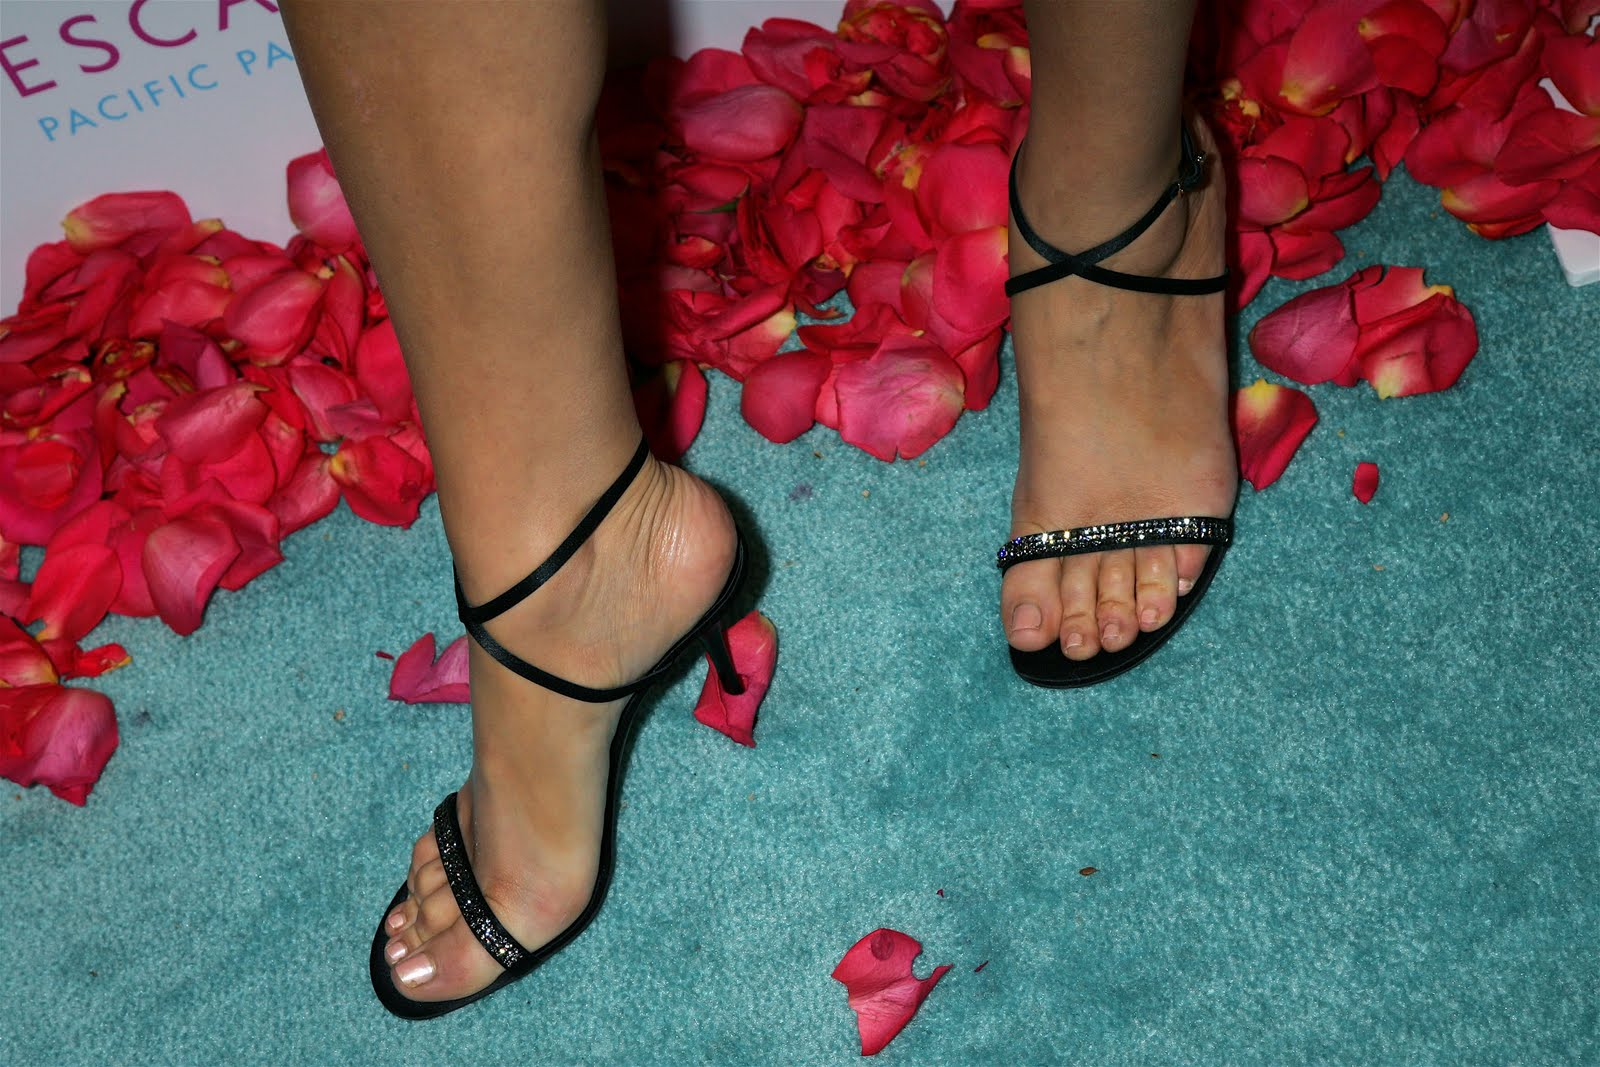 http://2.bp.blogspot.com/_UaLWp72nij4/TAAoRRICYQI/AAAAAAAANFc/pSpsqFP3AoA/s1600/maria-menounos-feet-2.jpg